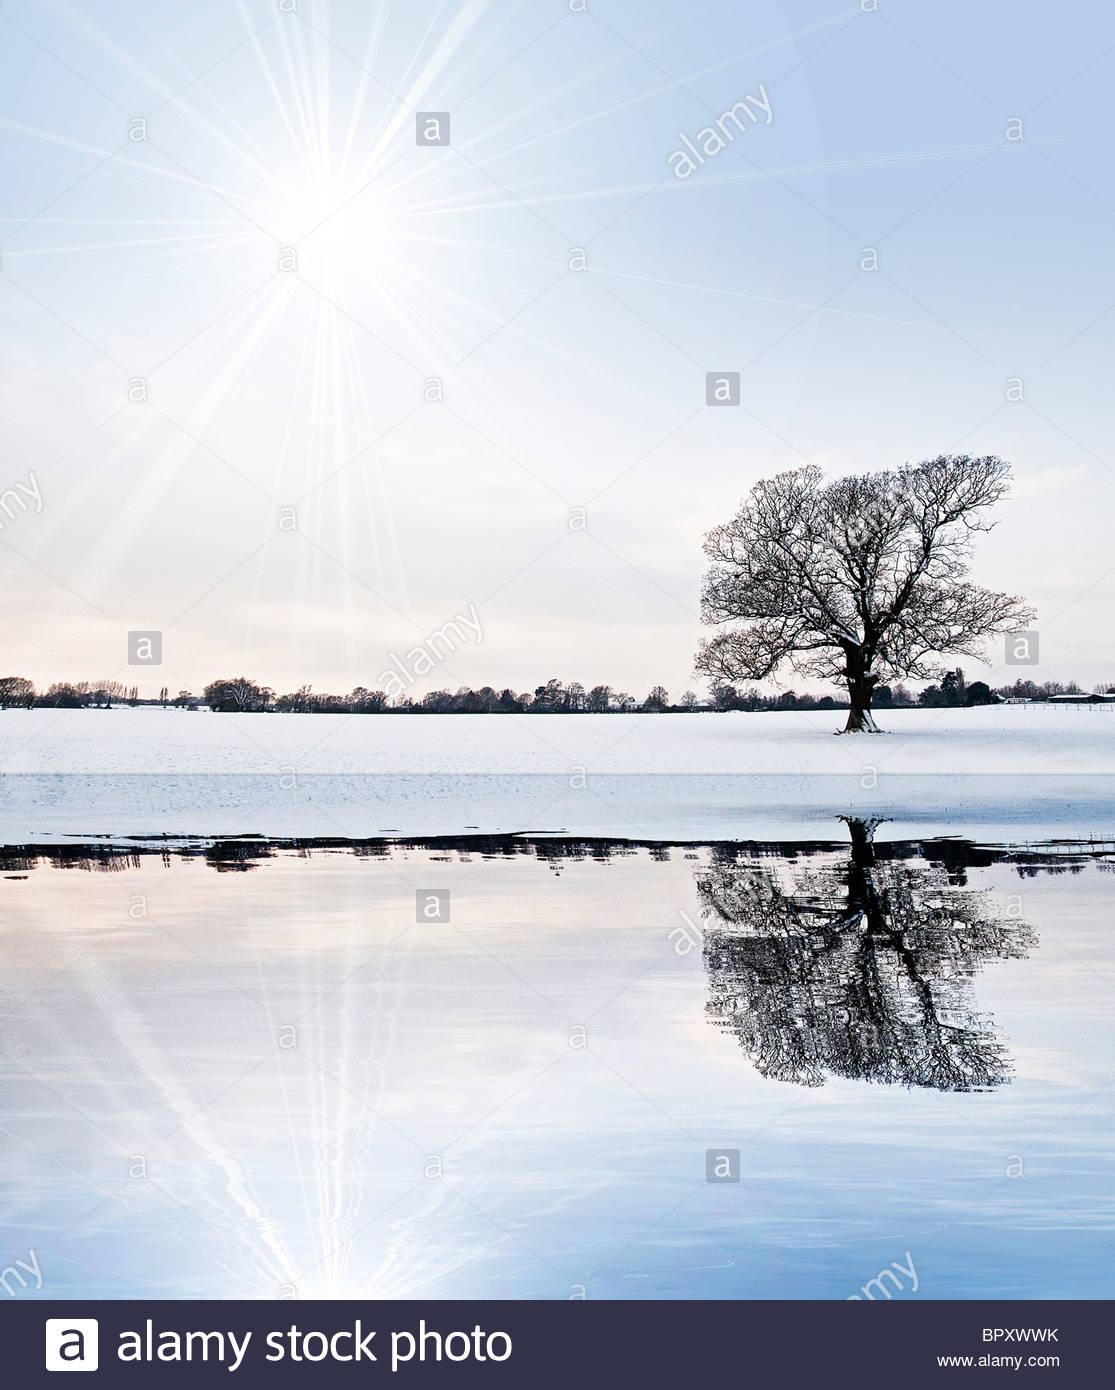 Schnee Baum Landschaft Reflexion Stockbild